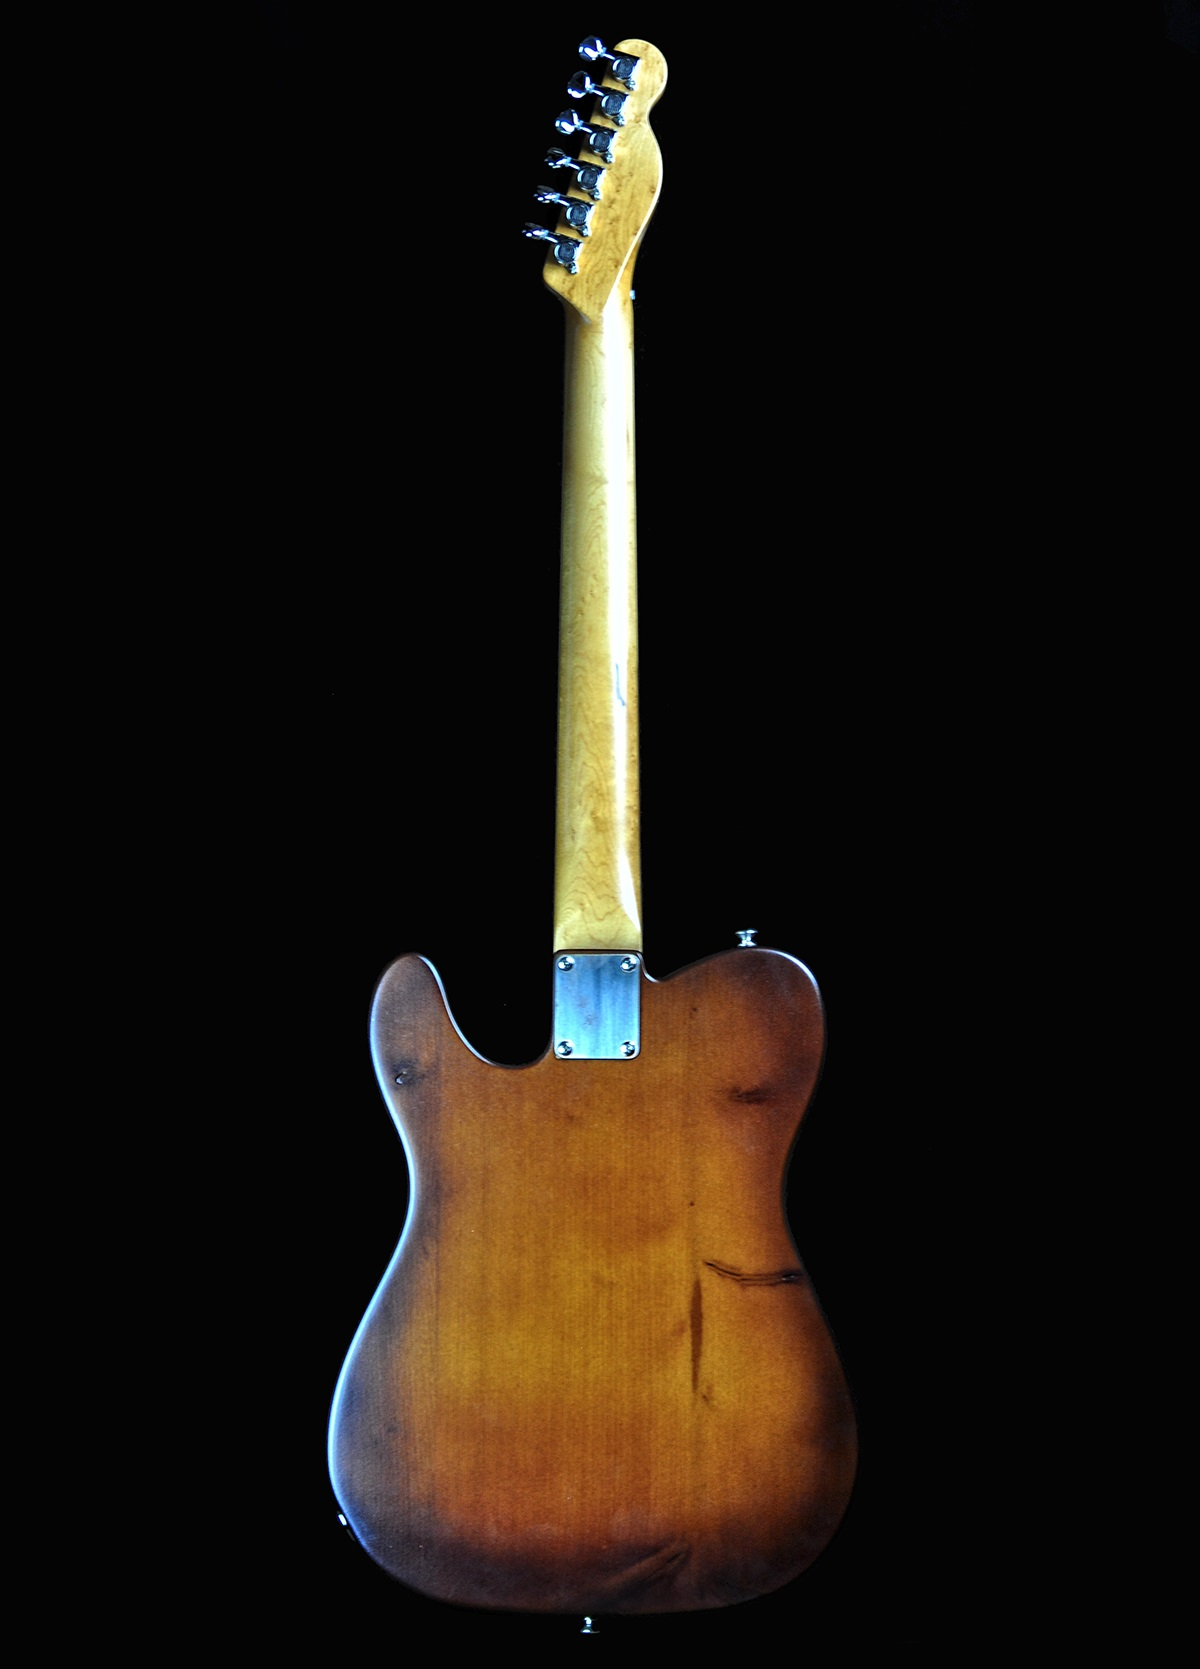 chitarra-tv-pine-retro-1